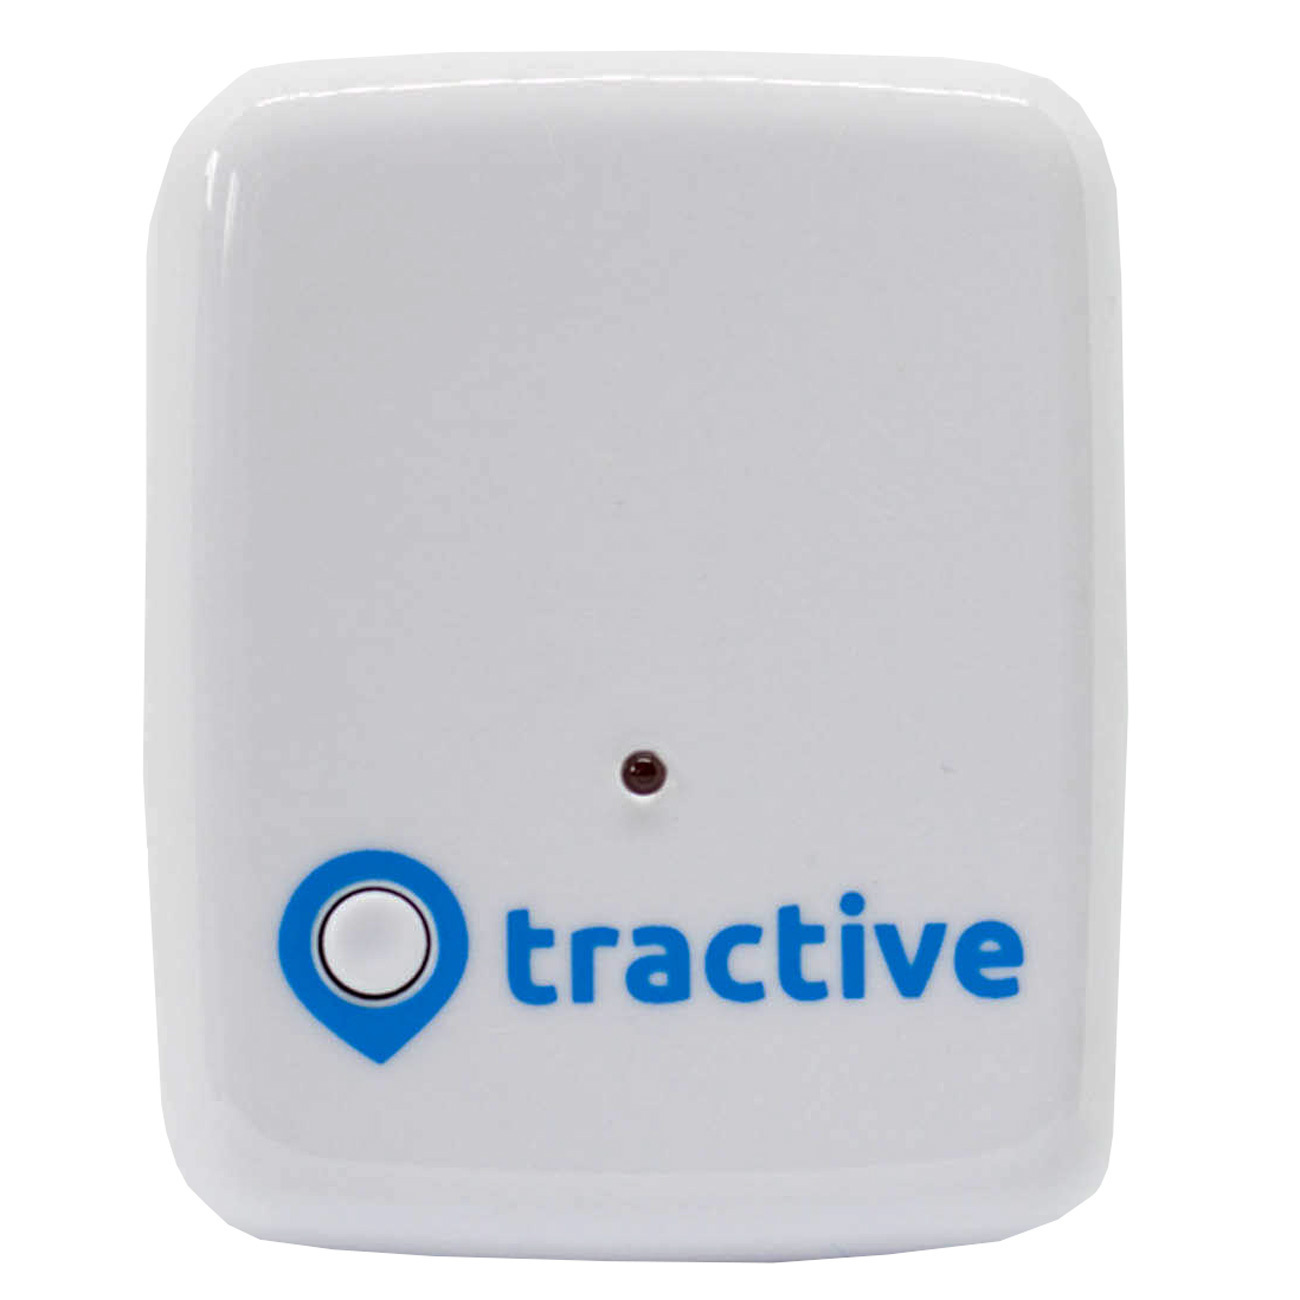 Tractive ВИА GPS трекер для домашних животных,  белый TRATR1, 0,035 кг, 43290